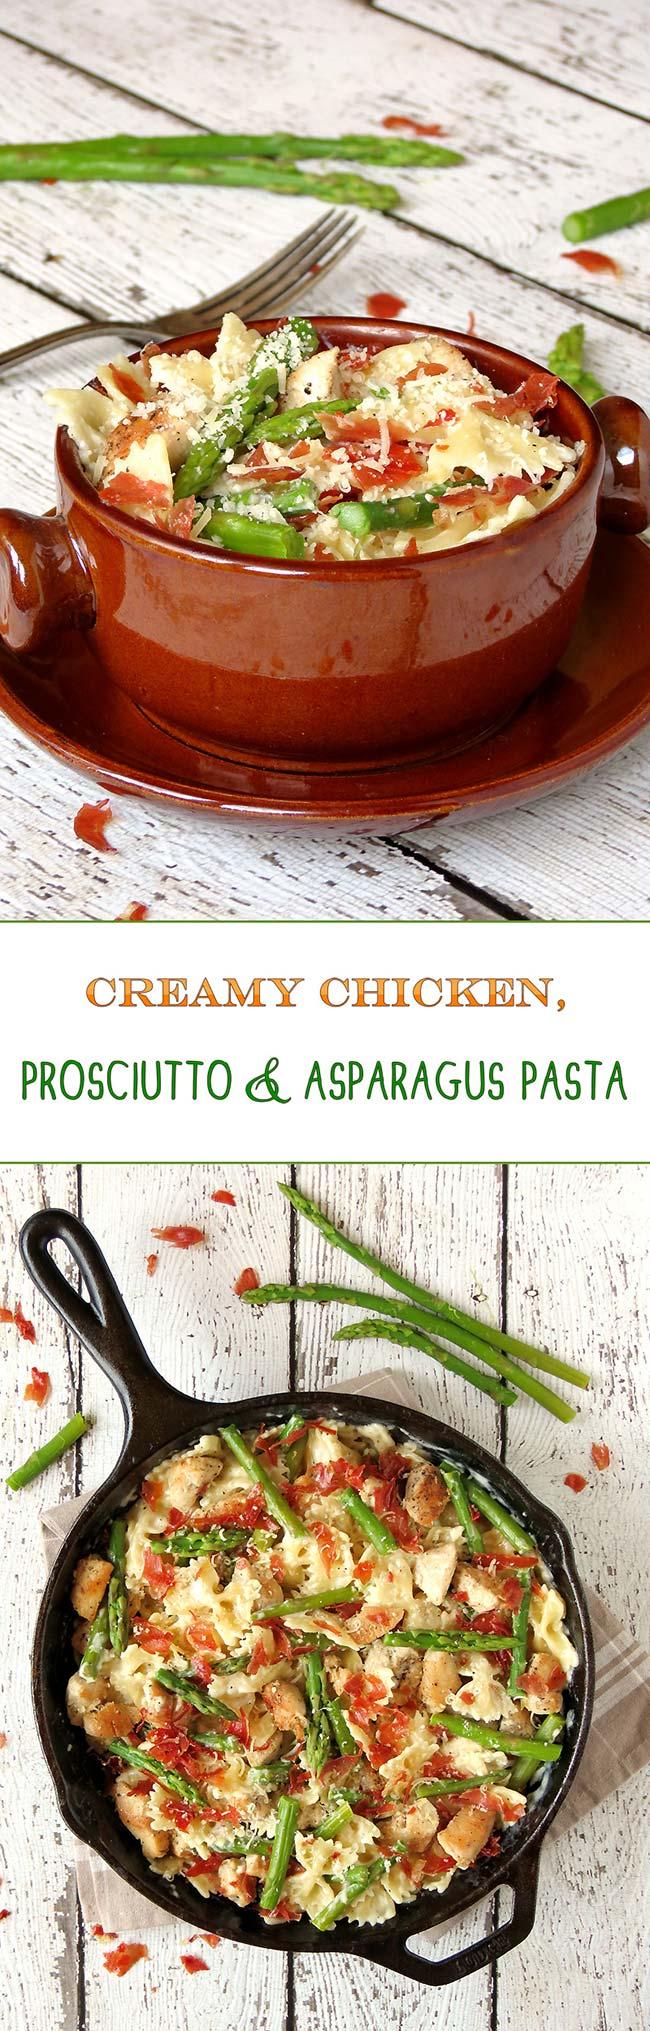 Creamy Chicken, Prosciutto And Asparagus Pasta   yummyaddiction.com